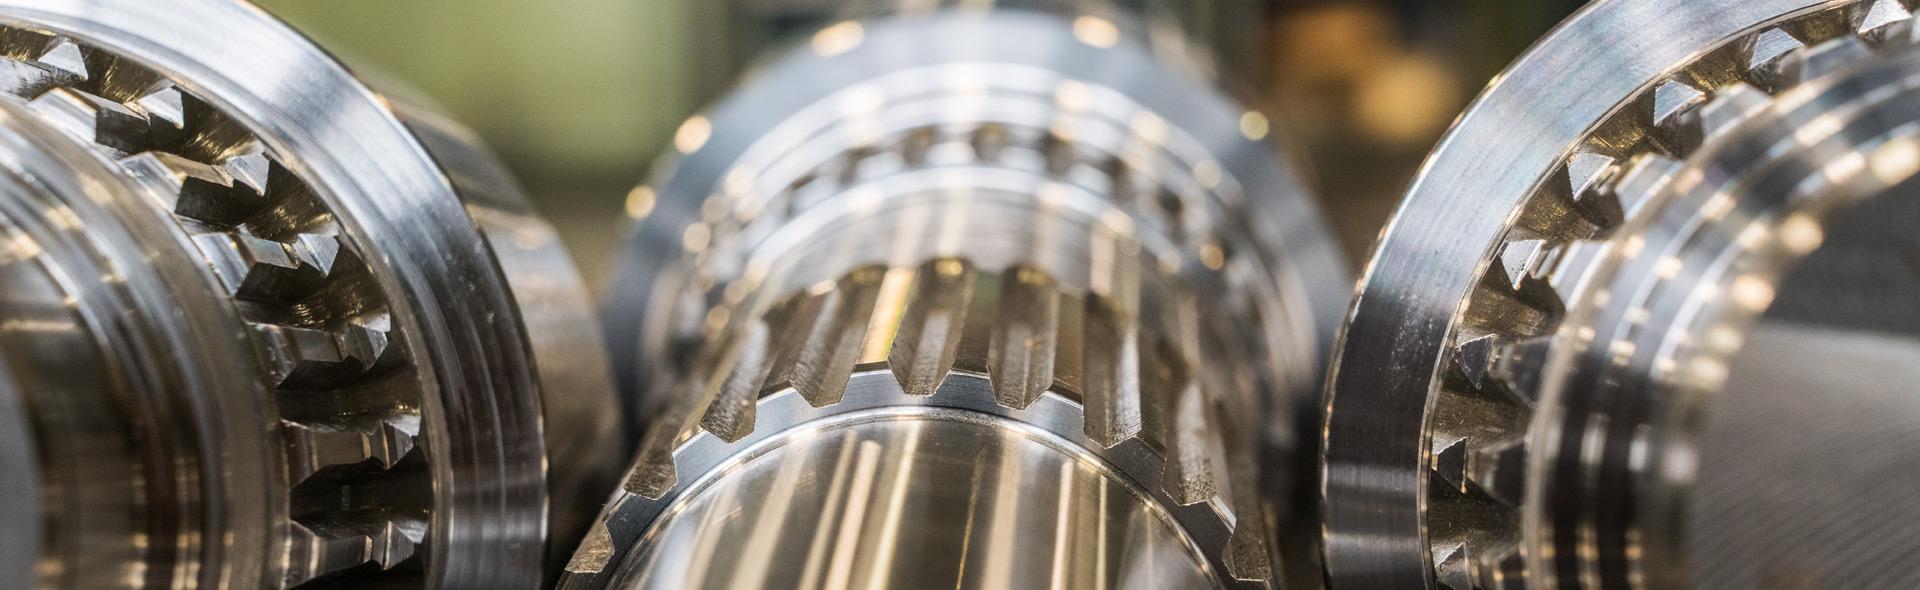 Kontakt | Maschinenbau Mundil GmbH & Co. KG